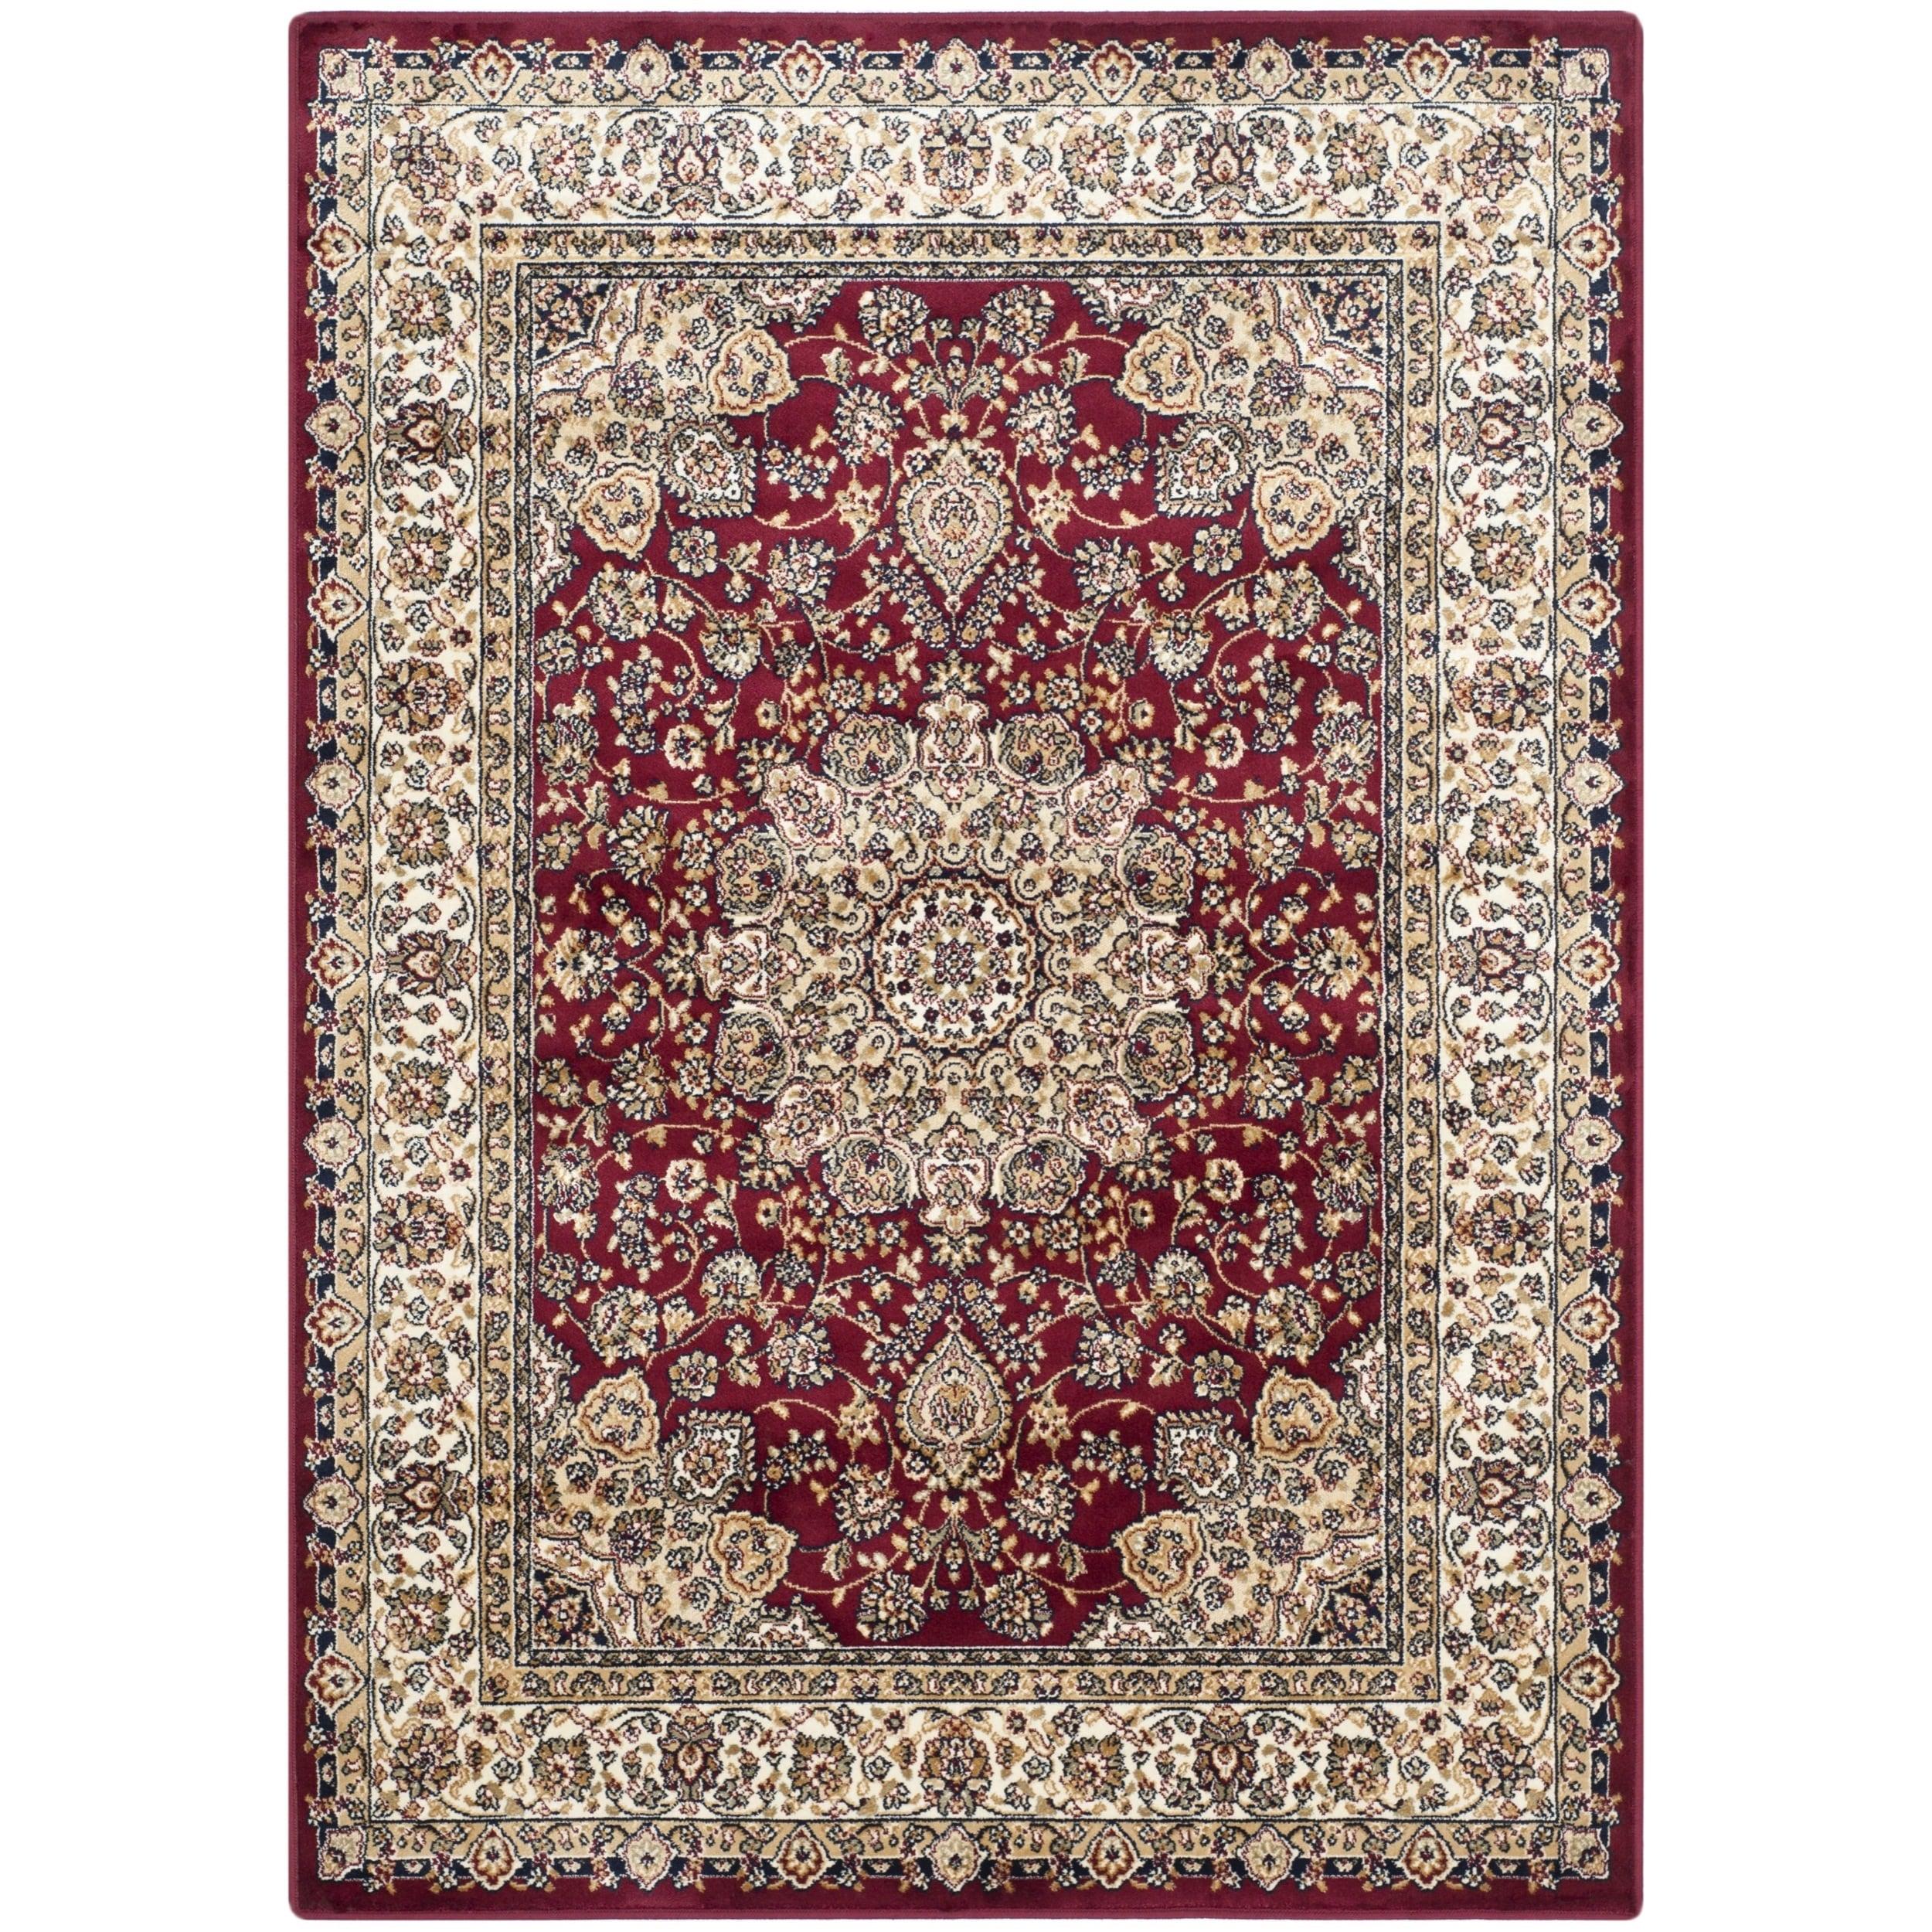 Safavieh Persian Garden Red/ Ivory Viscose Rug (6'7 x 9'2...